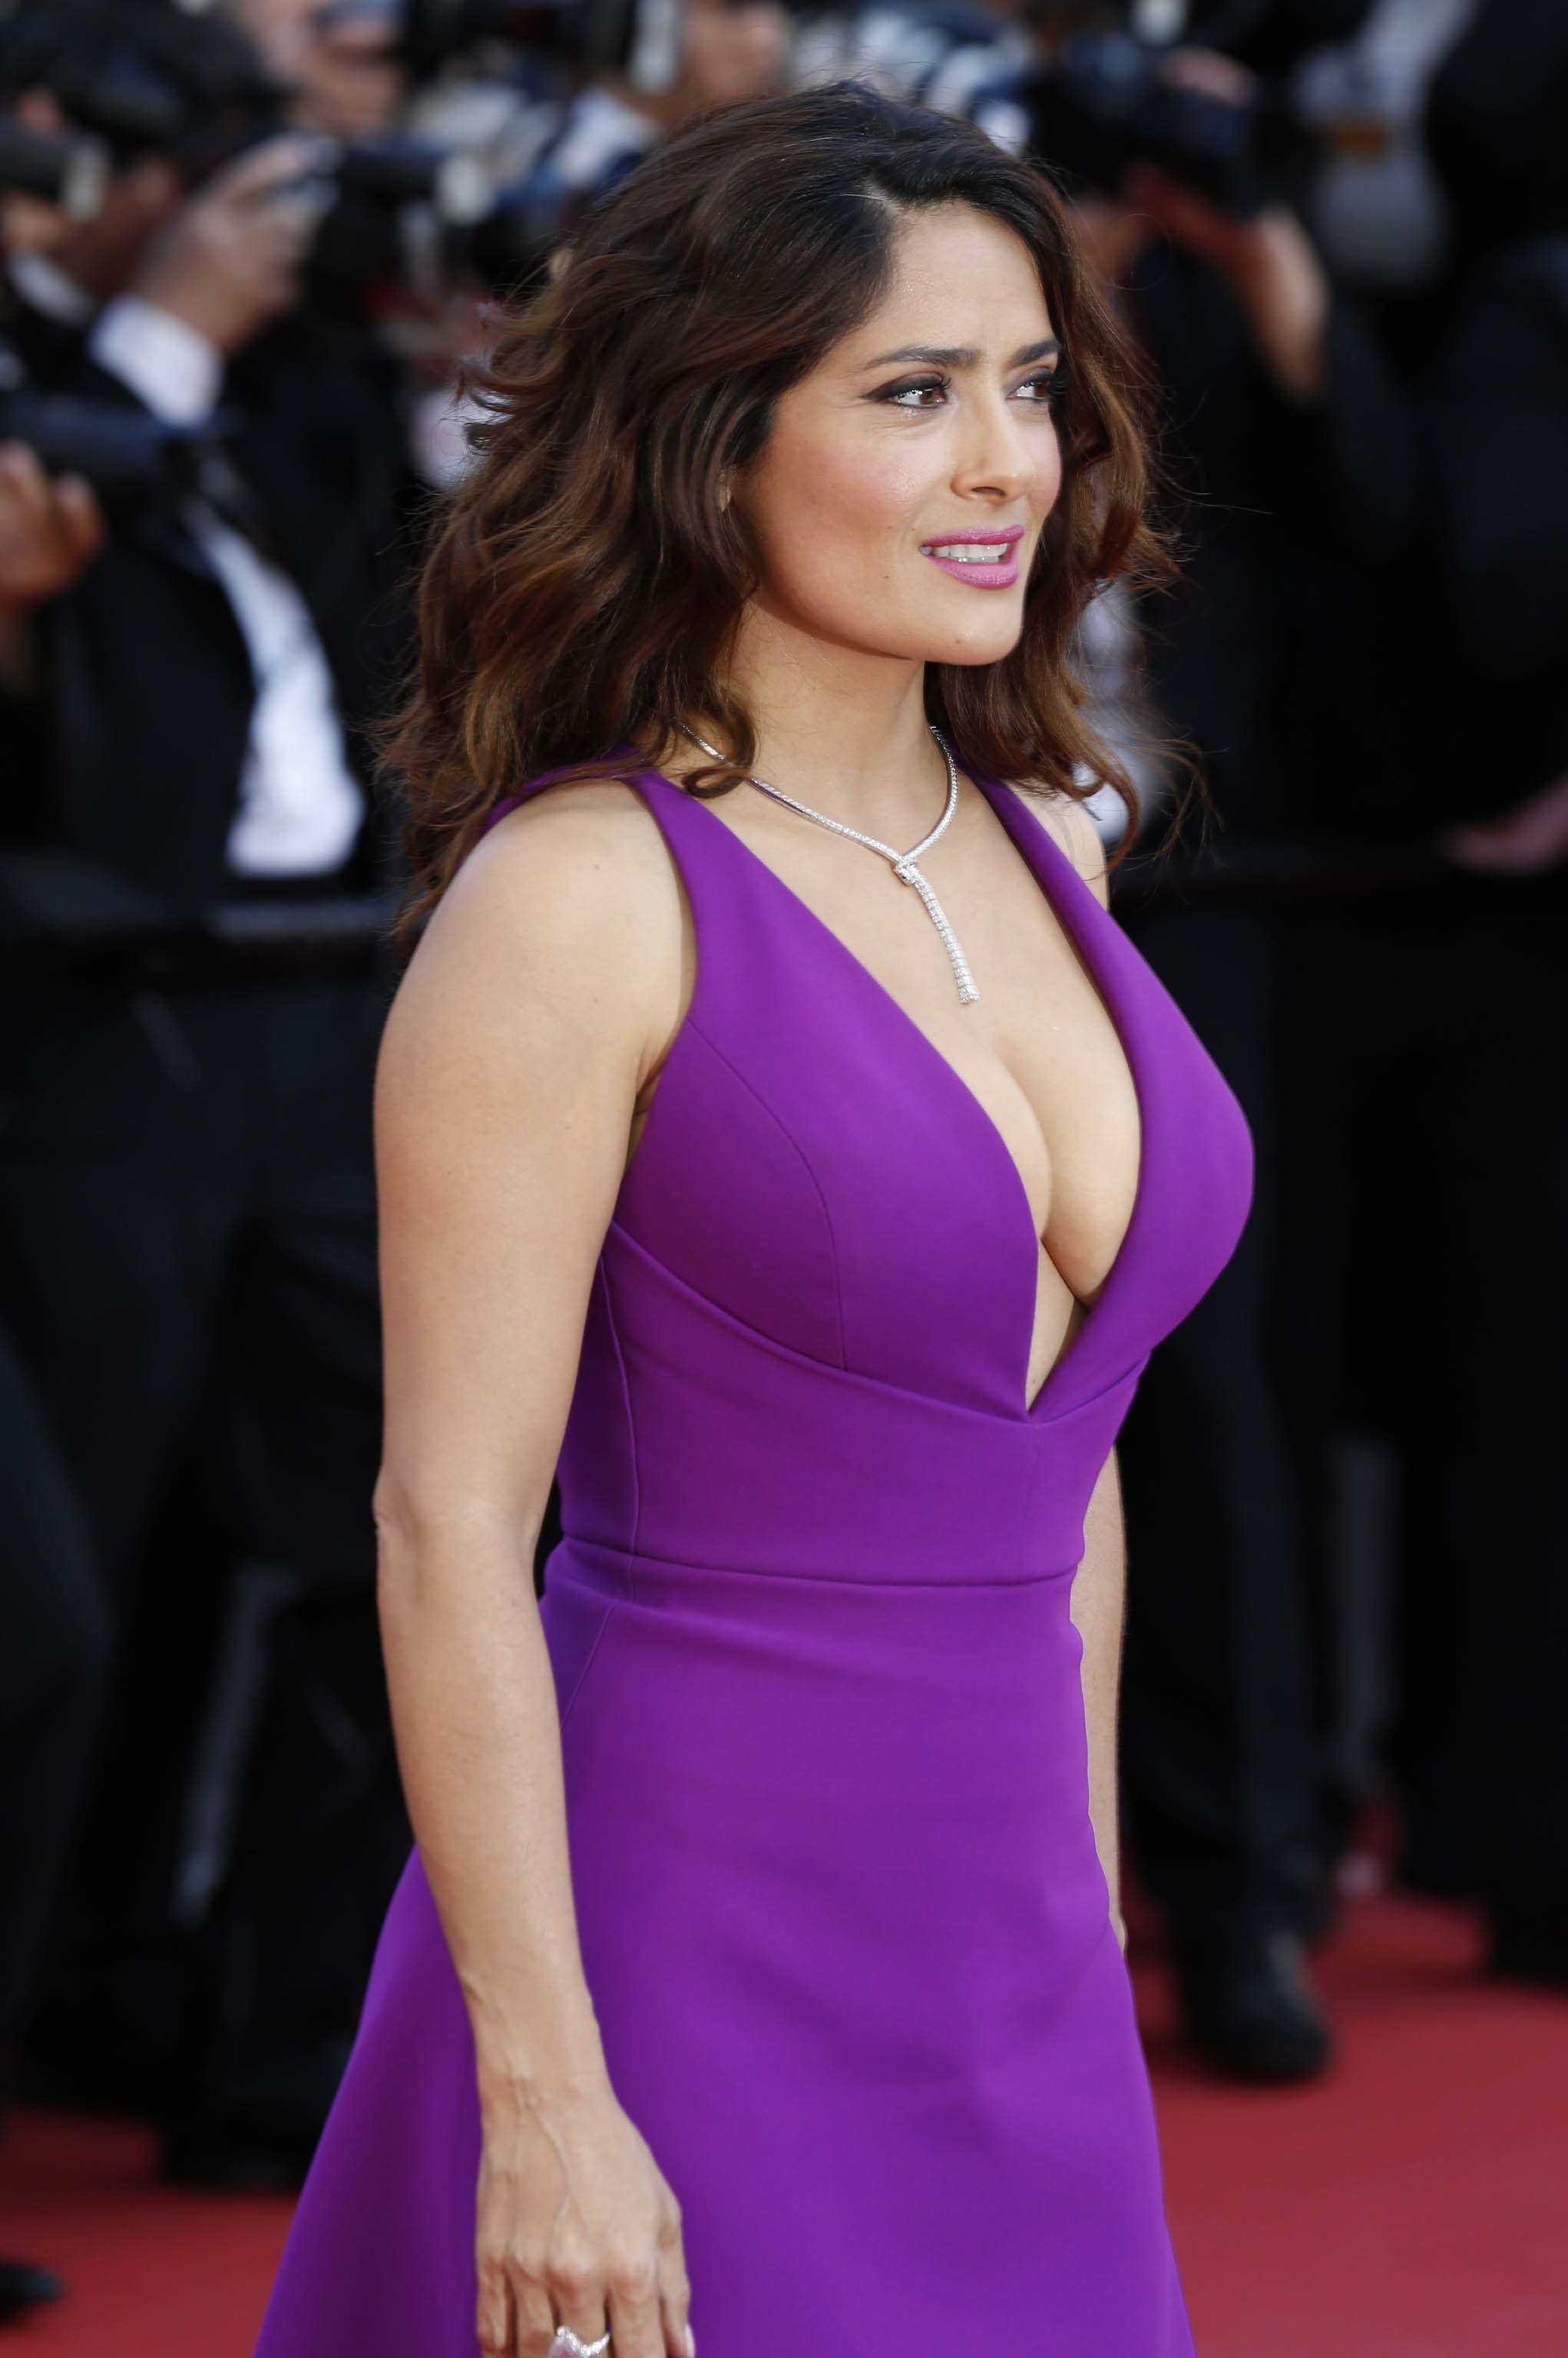 Salma Hayek - Famous Nipple